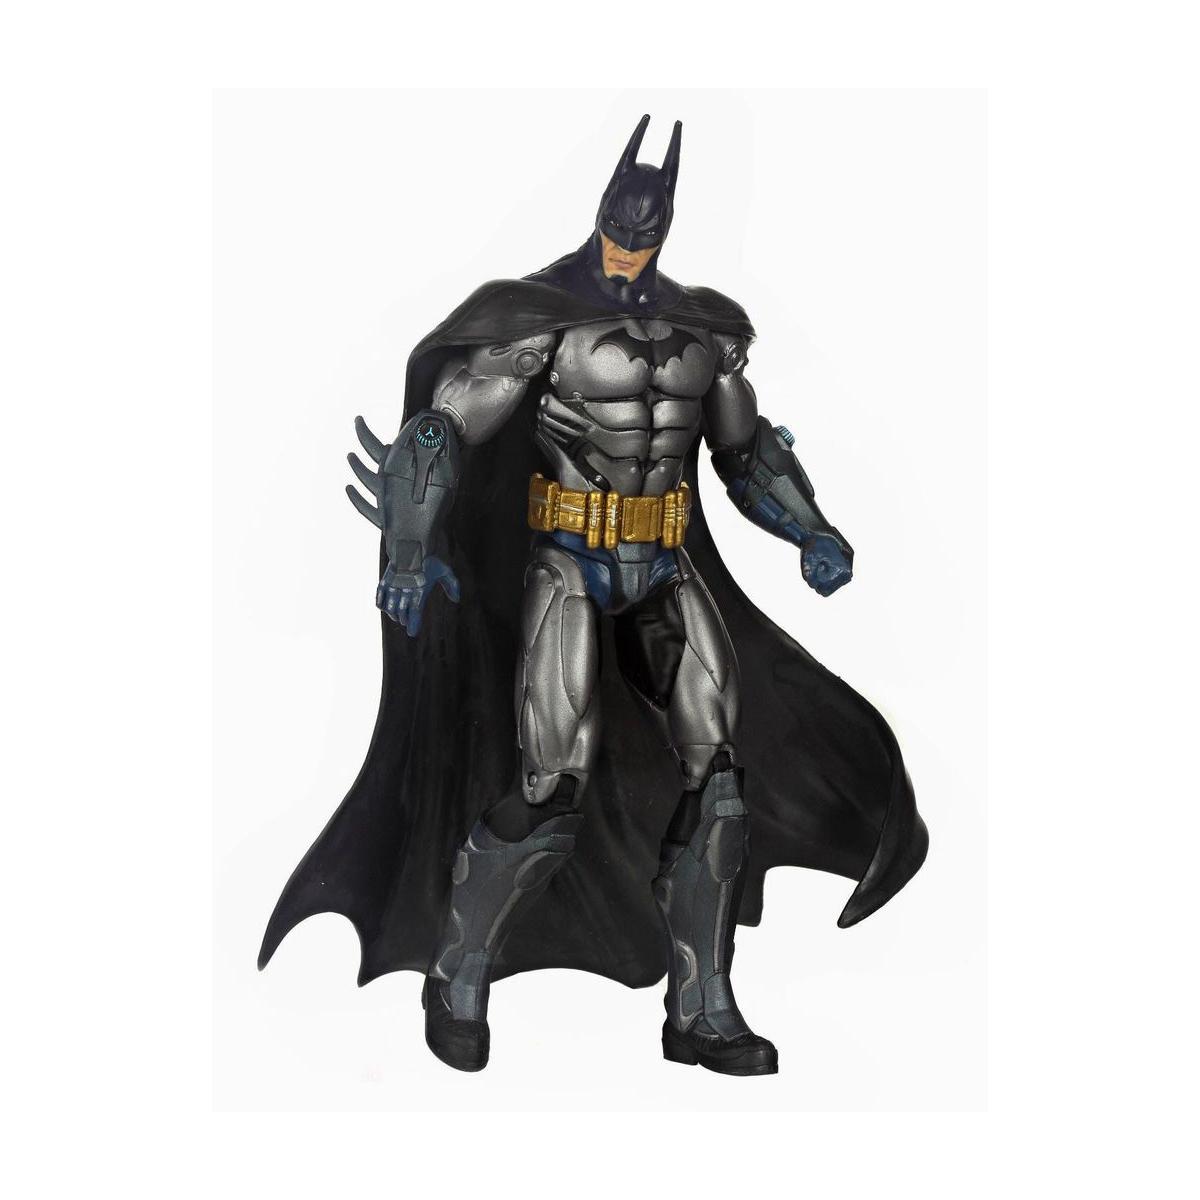 Boneco (Action Figure) Batman (Blindado) Arkham Asylum DC Collectibles